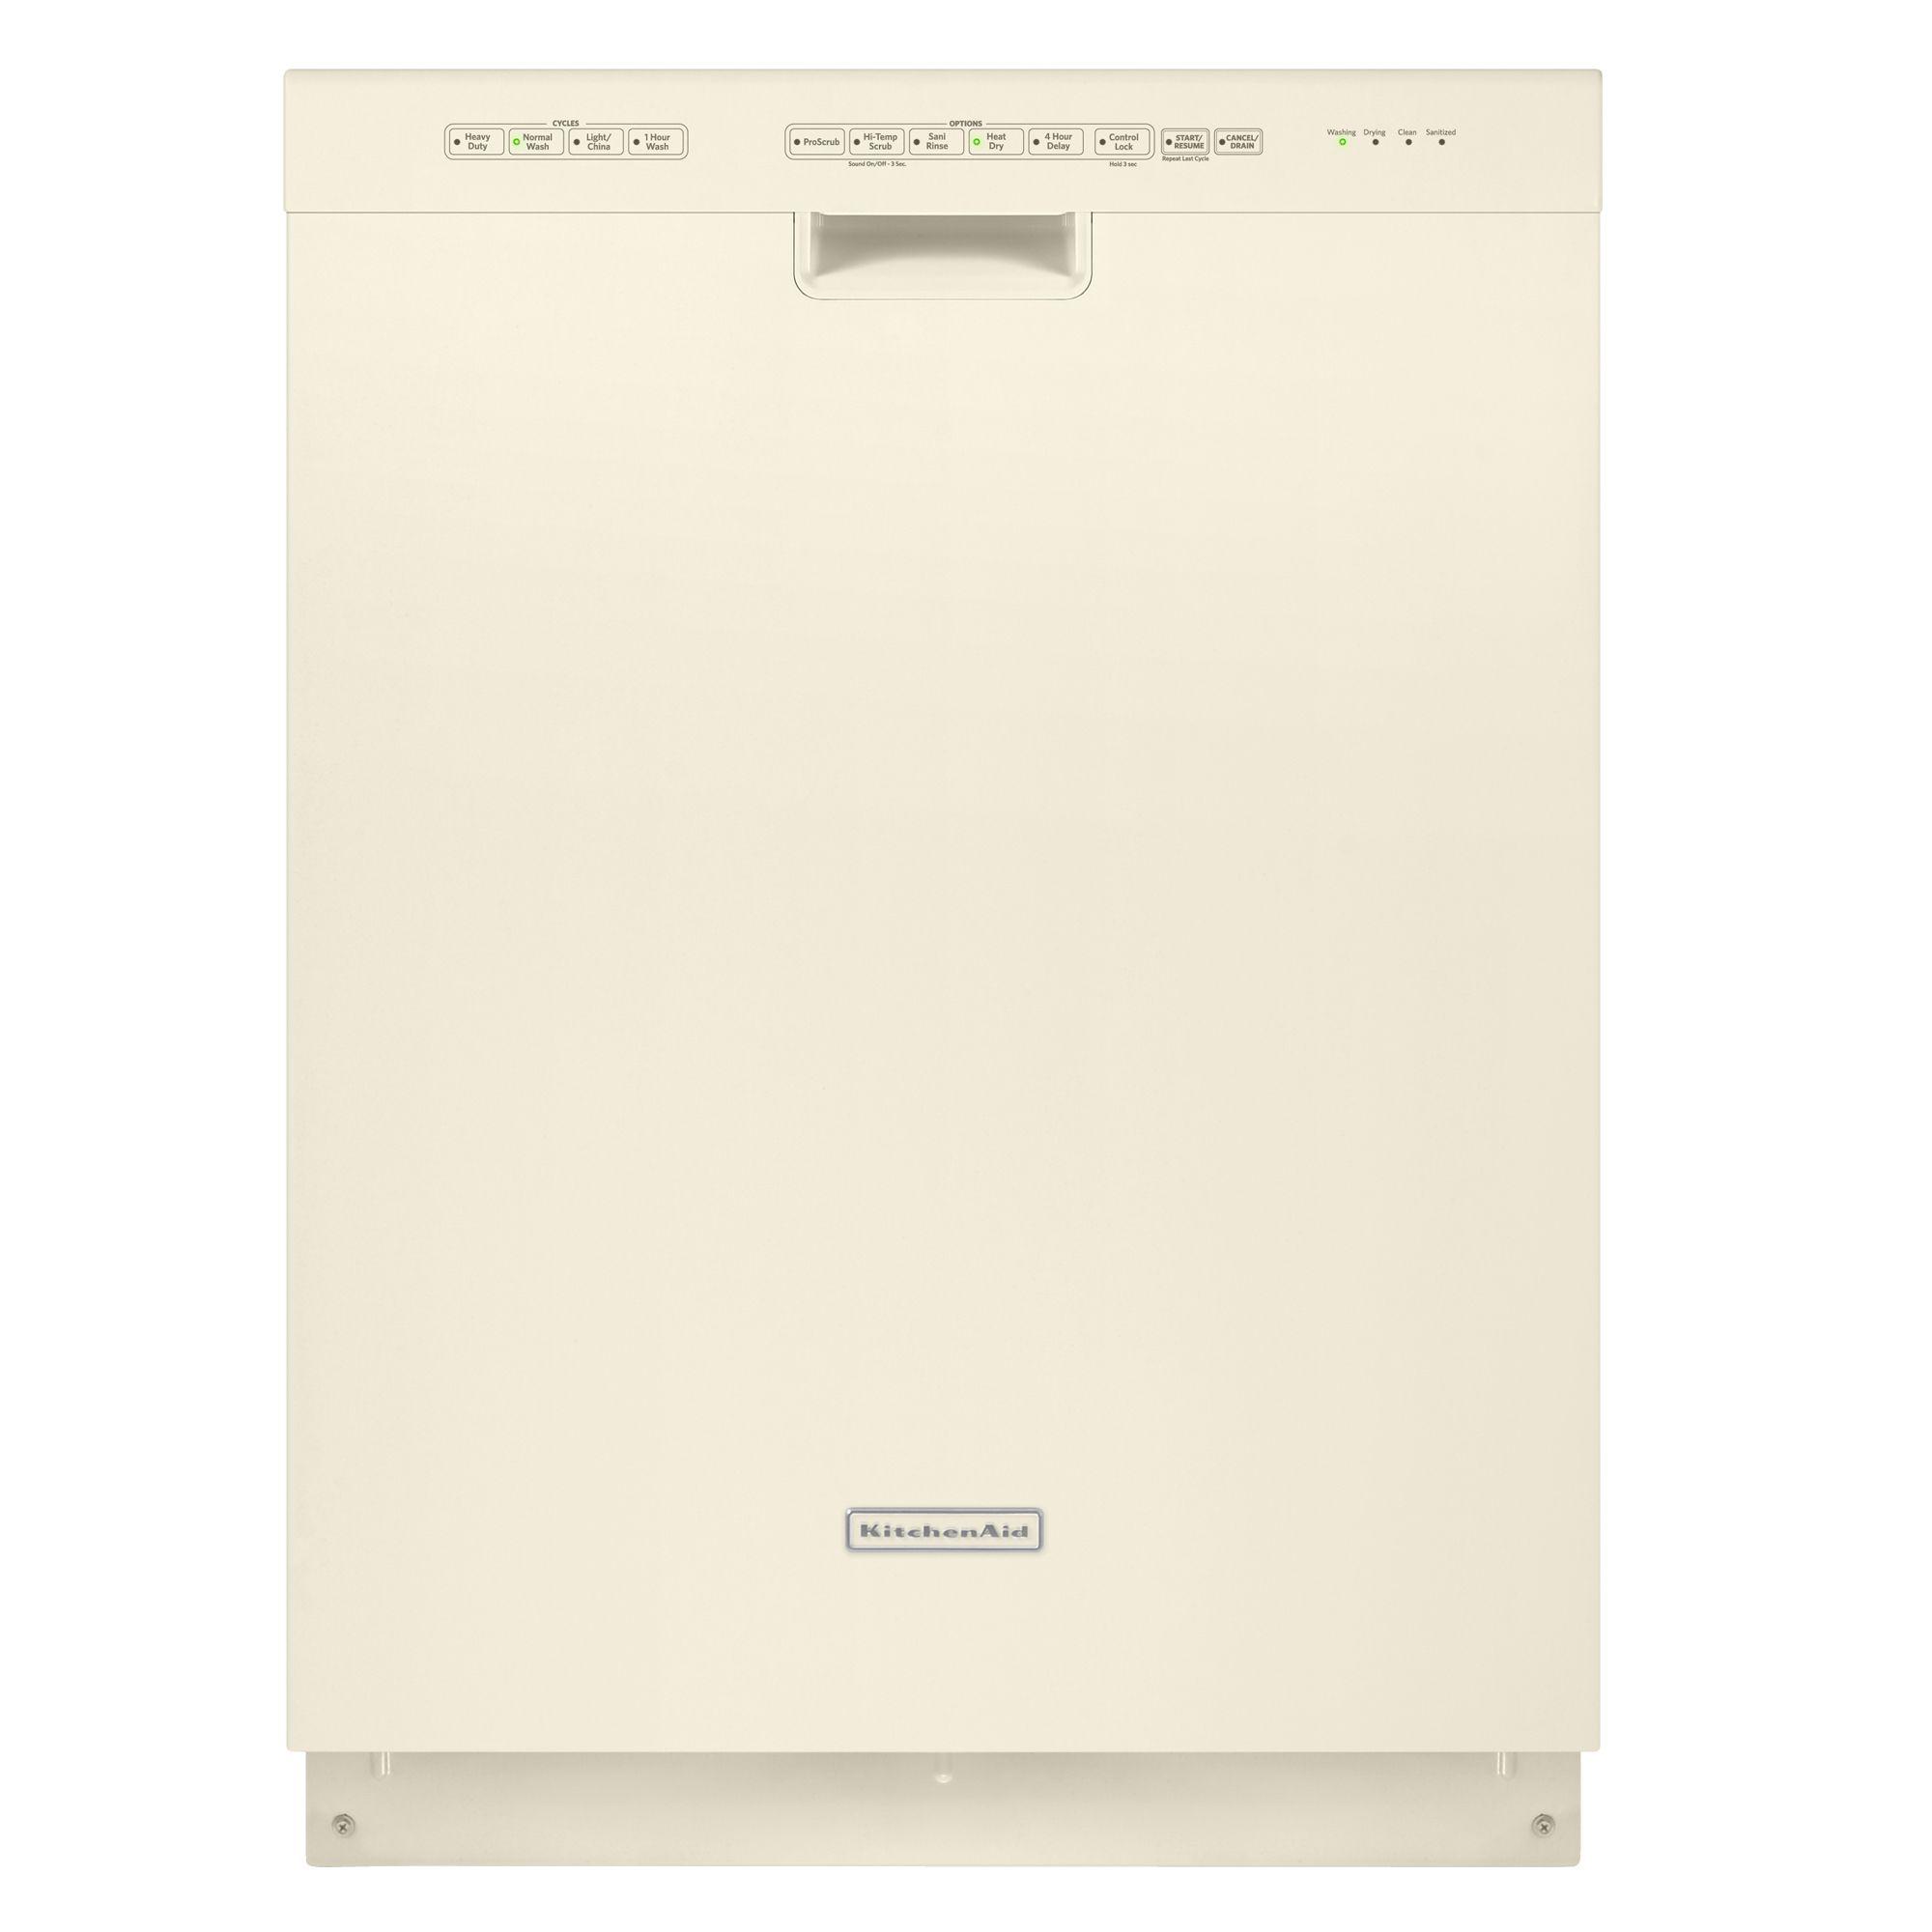 Kitchen Aid Dishwasher Manual Affordable Kitchenaid Dishwasher